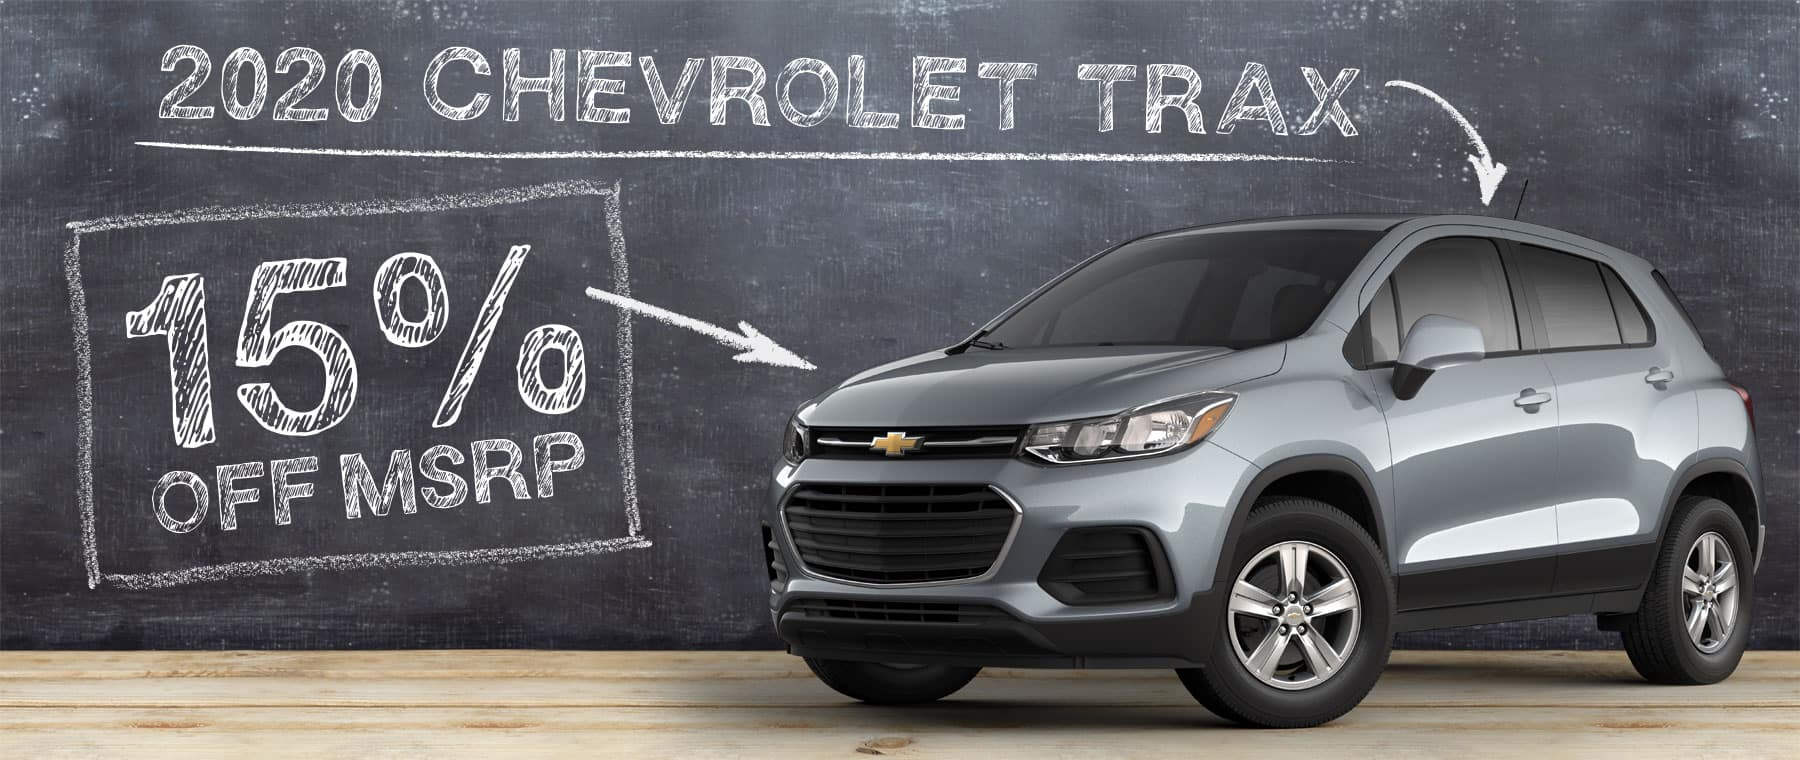 15% off 2020 Chevrolet Trax